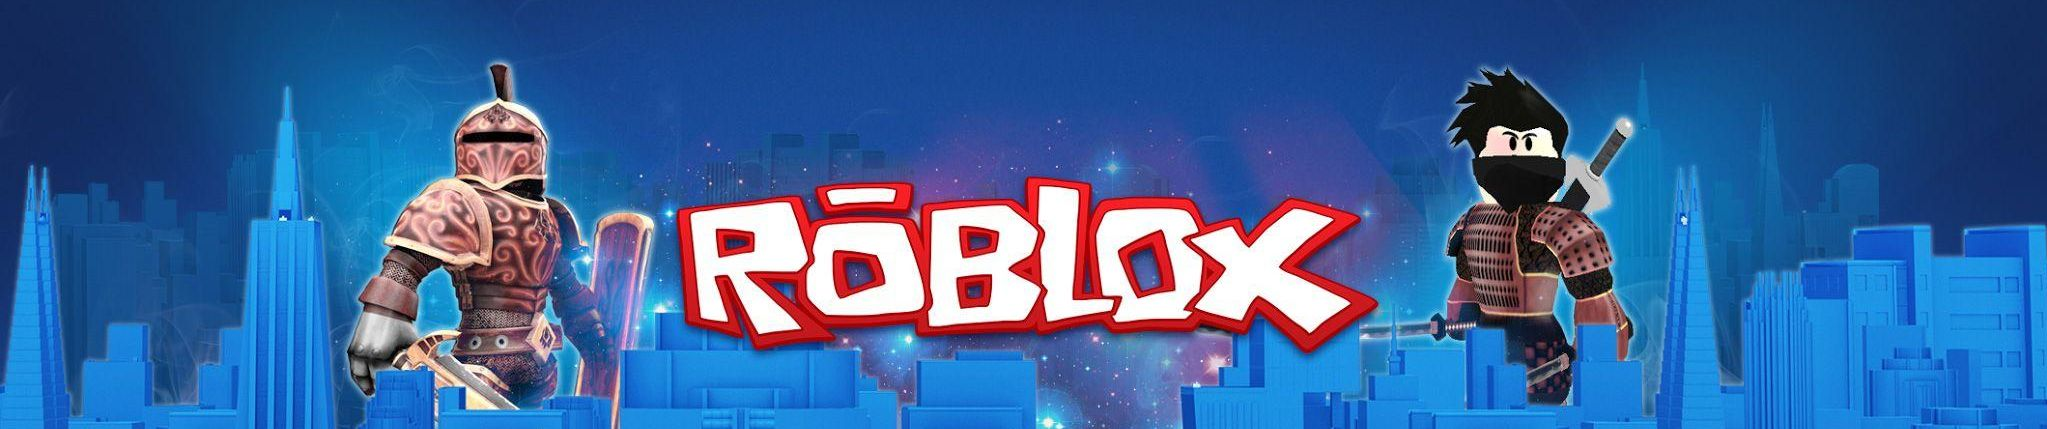 Loud Roblox Boombox Ids   Roblox Cake